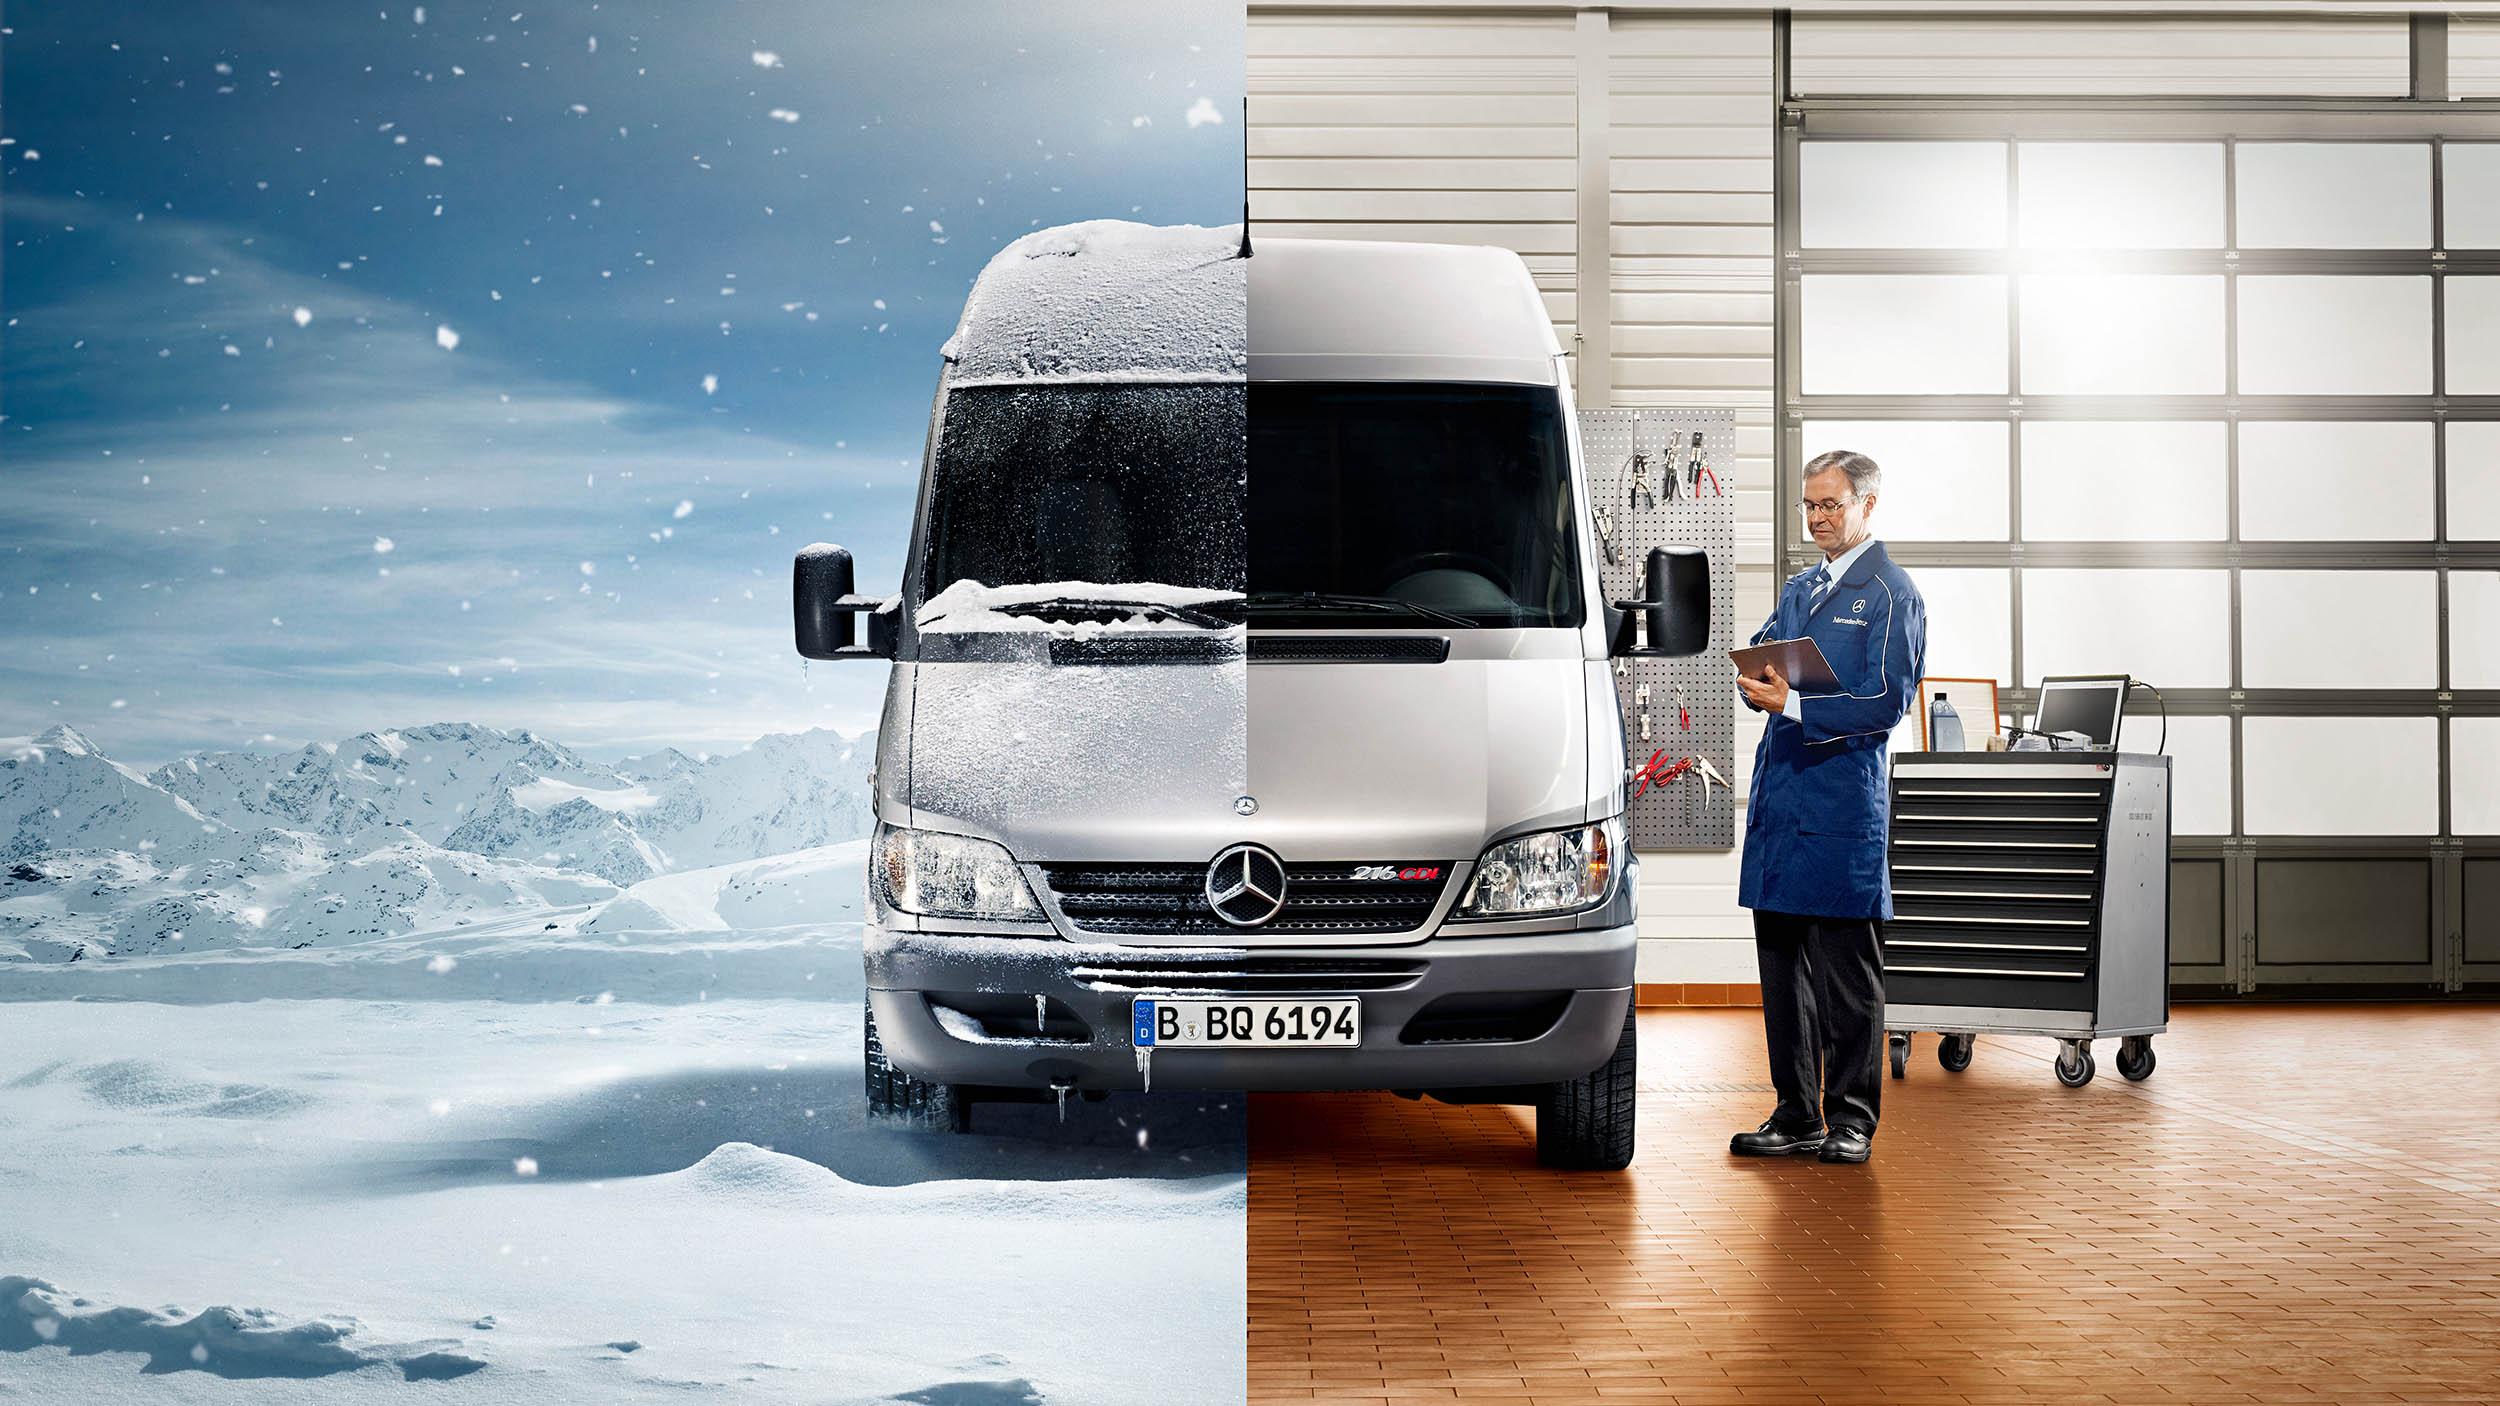 Mercedes Benz Winteraktion